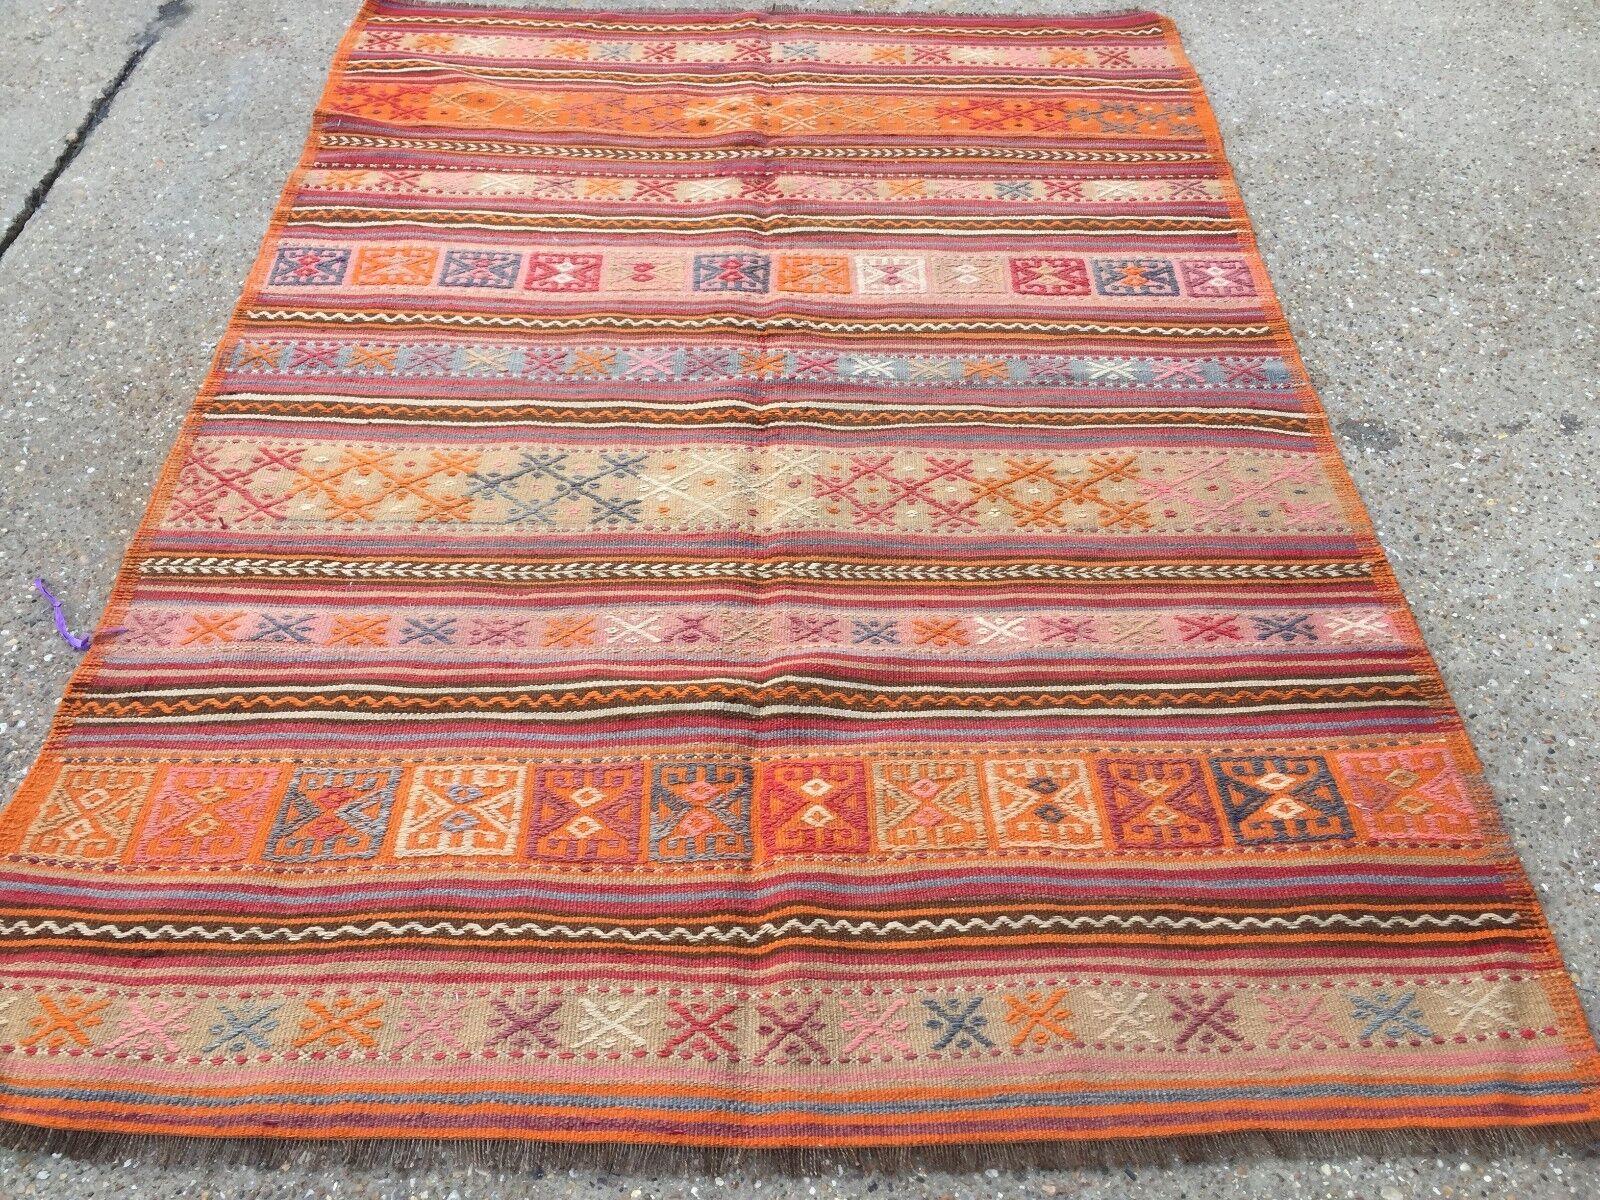 Antique Turkish Kilim rug shabby 206x142cm vintage ancien laine Country Home Kelim 206x142cm shabby 08c543